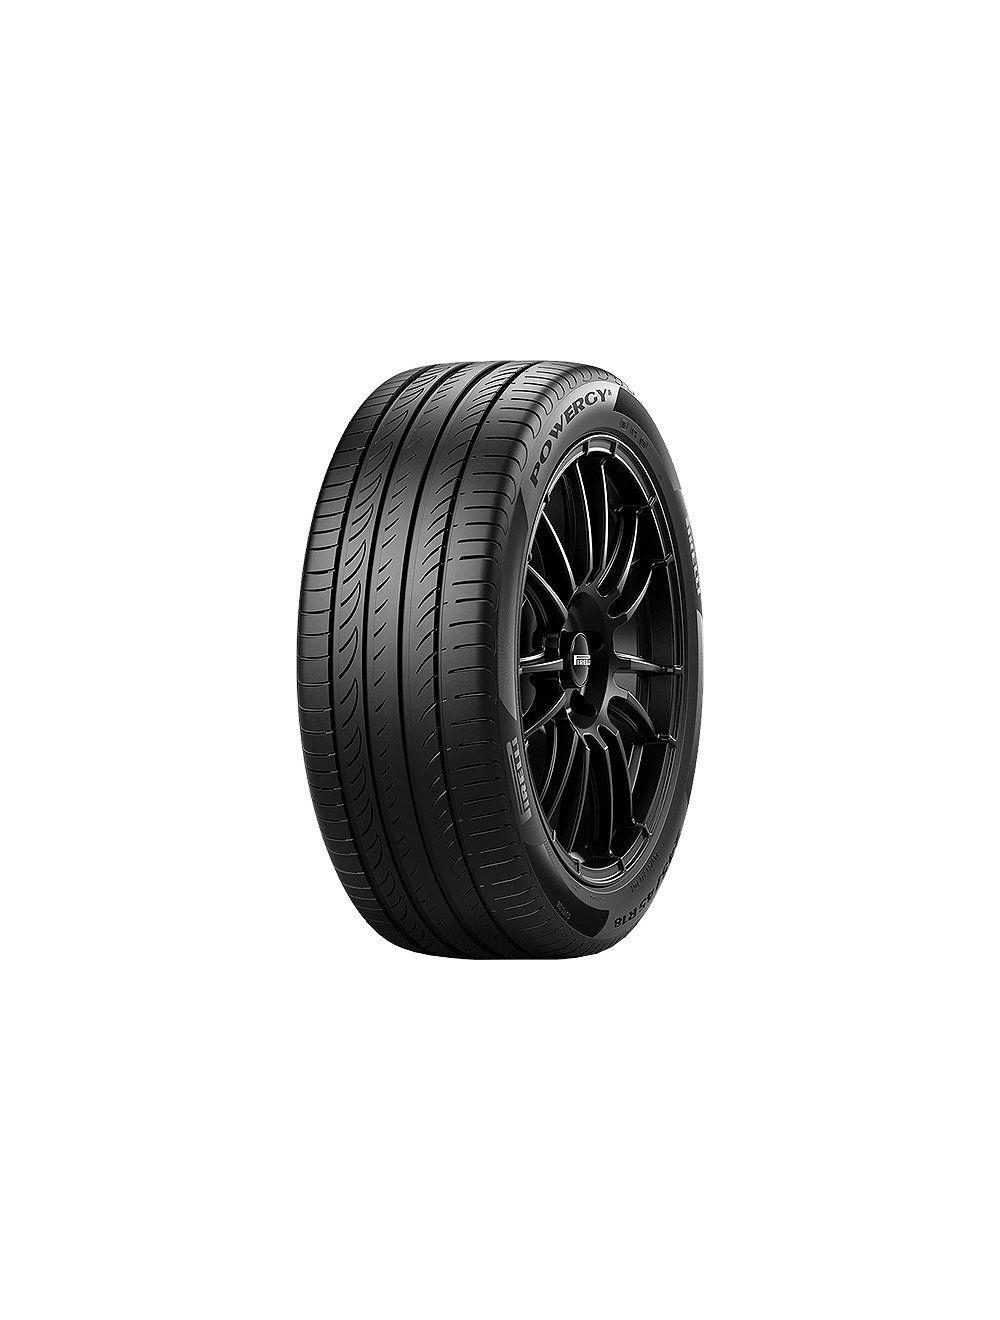 Pirelli 245/40R19 Y Powergy XL Nyári gumi